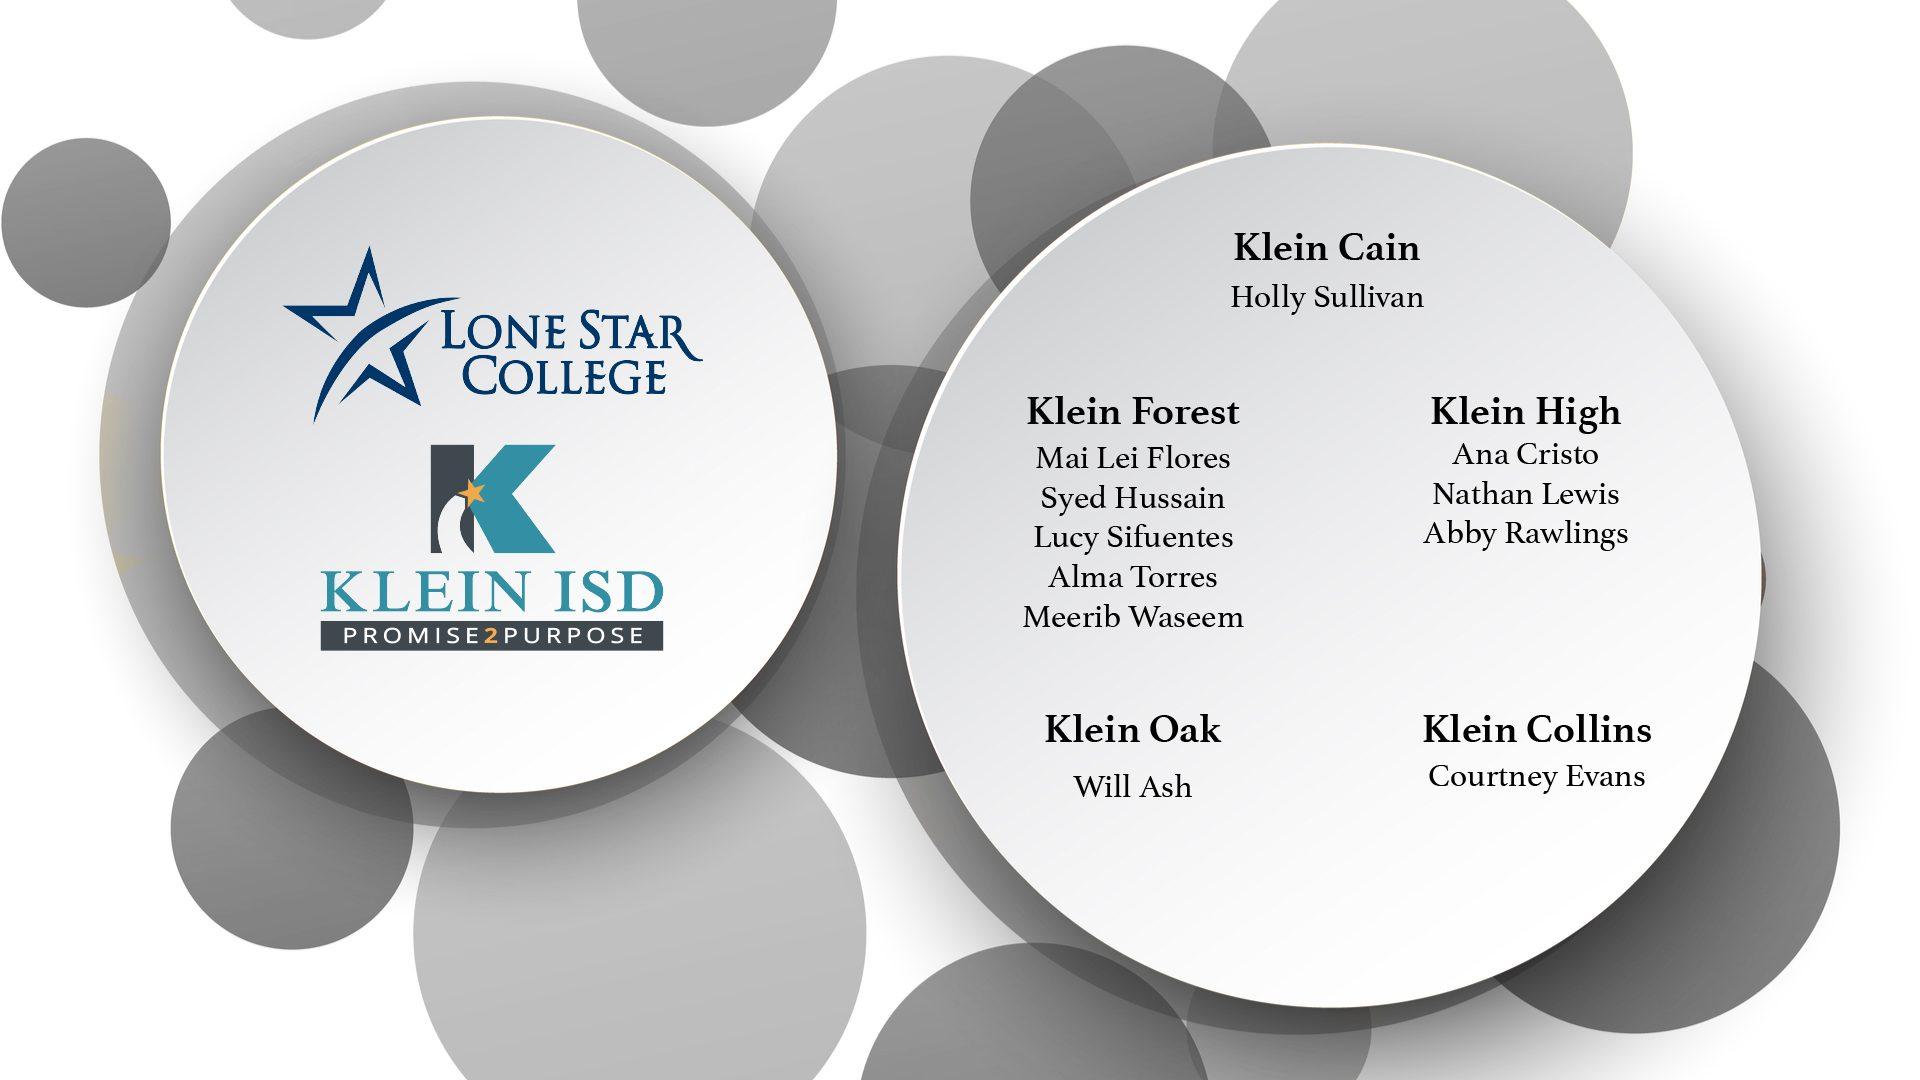 All 5 High Schools Represented in Latest Leadership Development Program Cohort